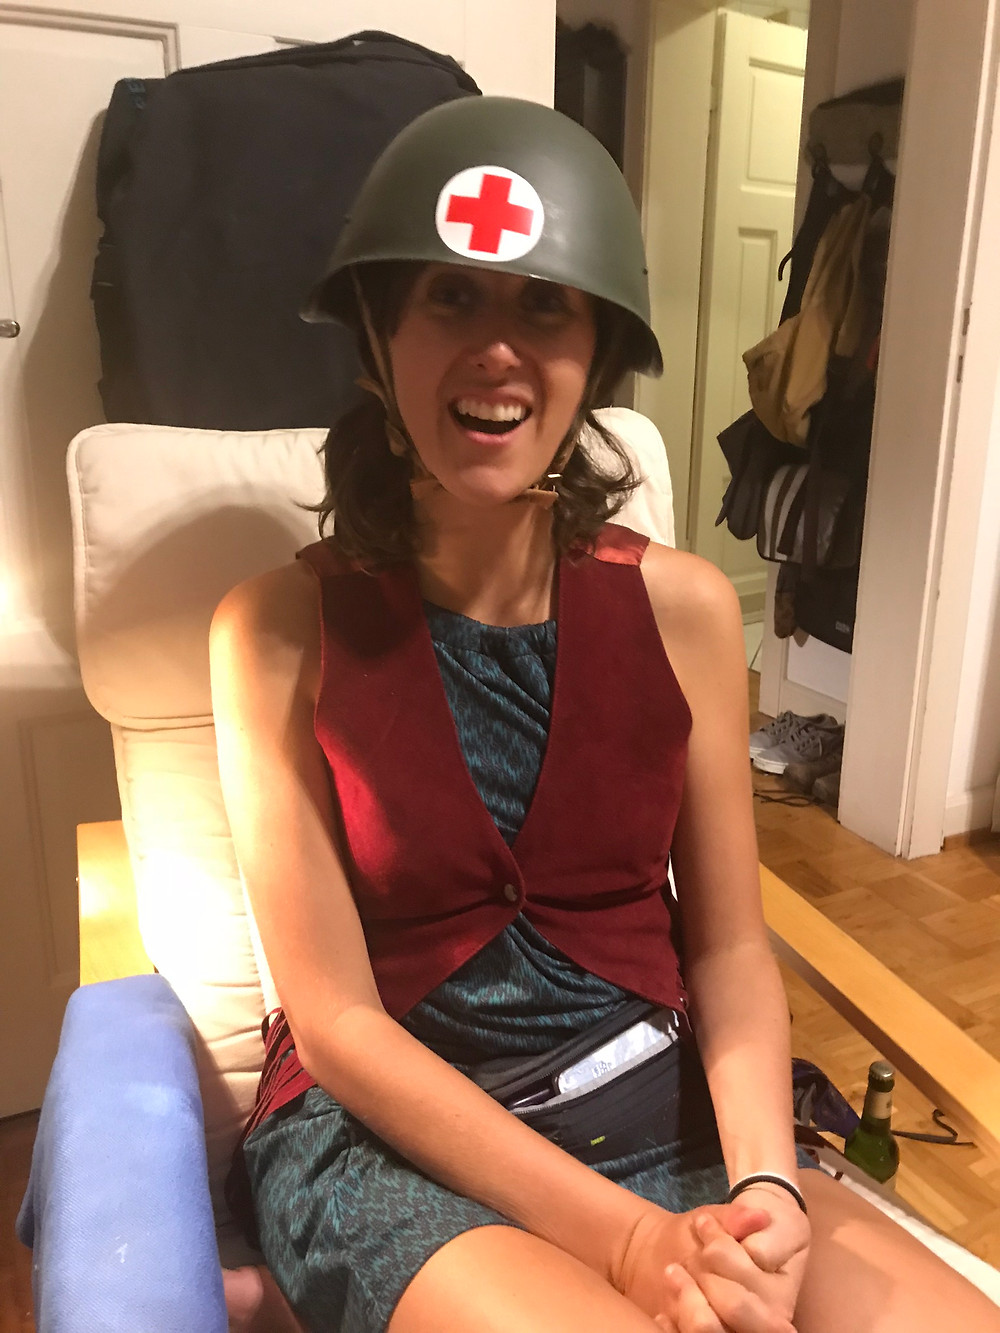 Woman wearing red cross medic helmet.